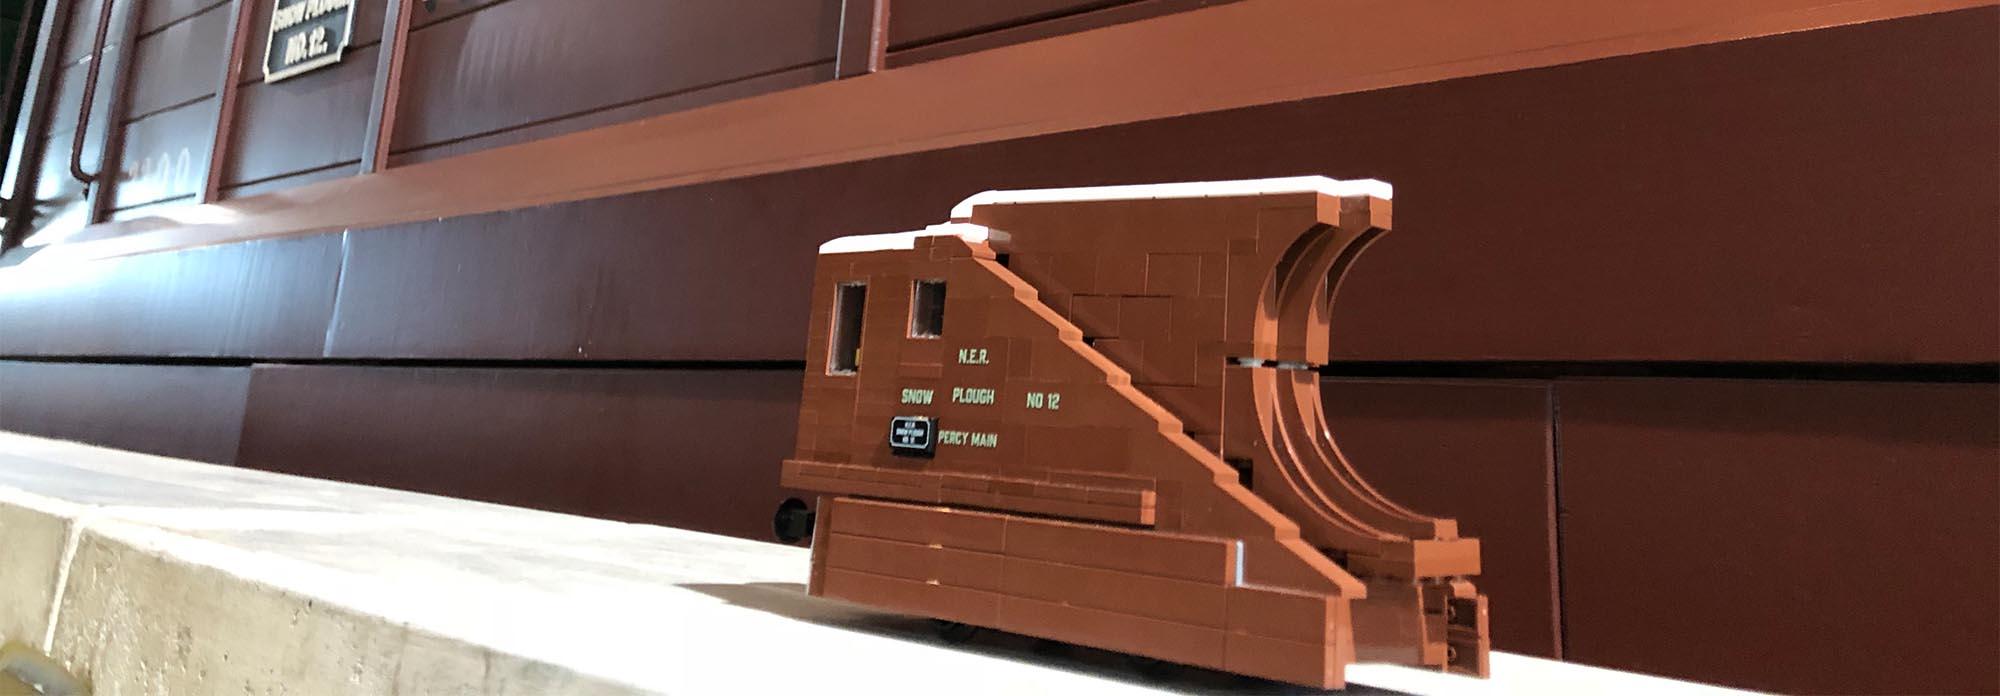 LEGO rolling stock models by LNUR members